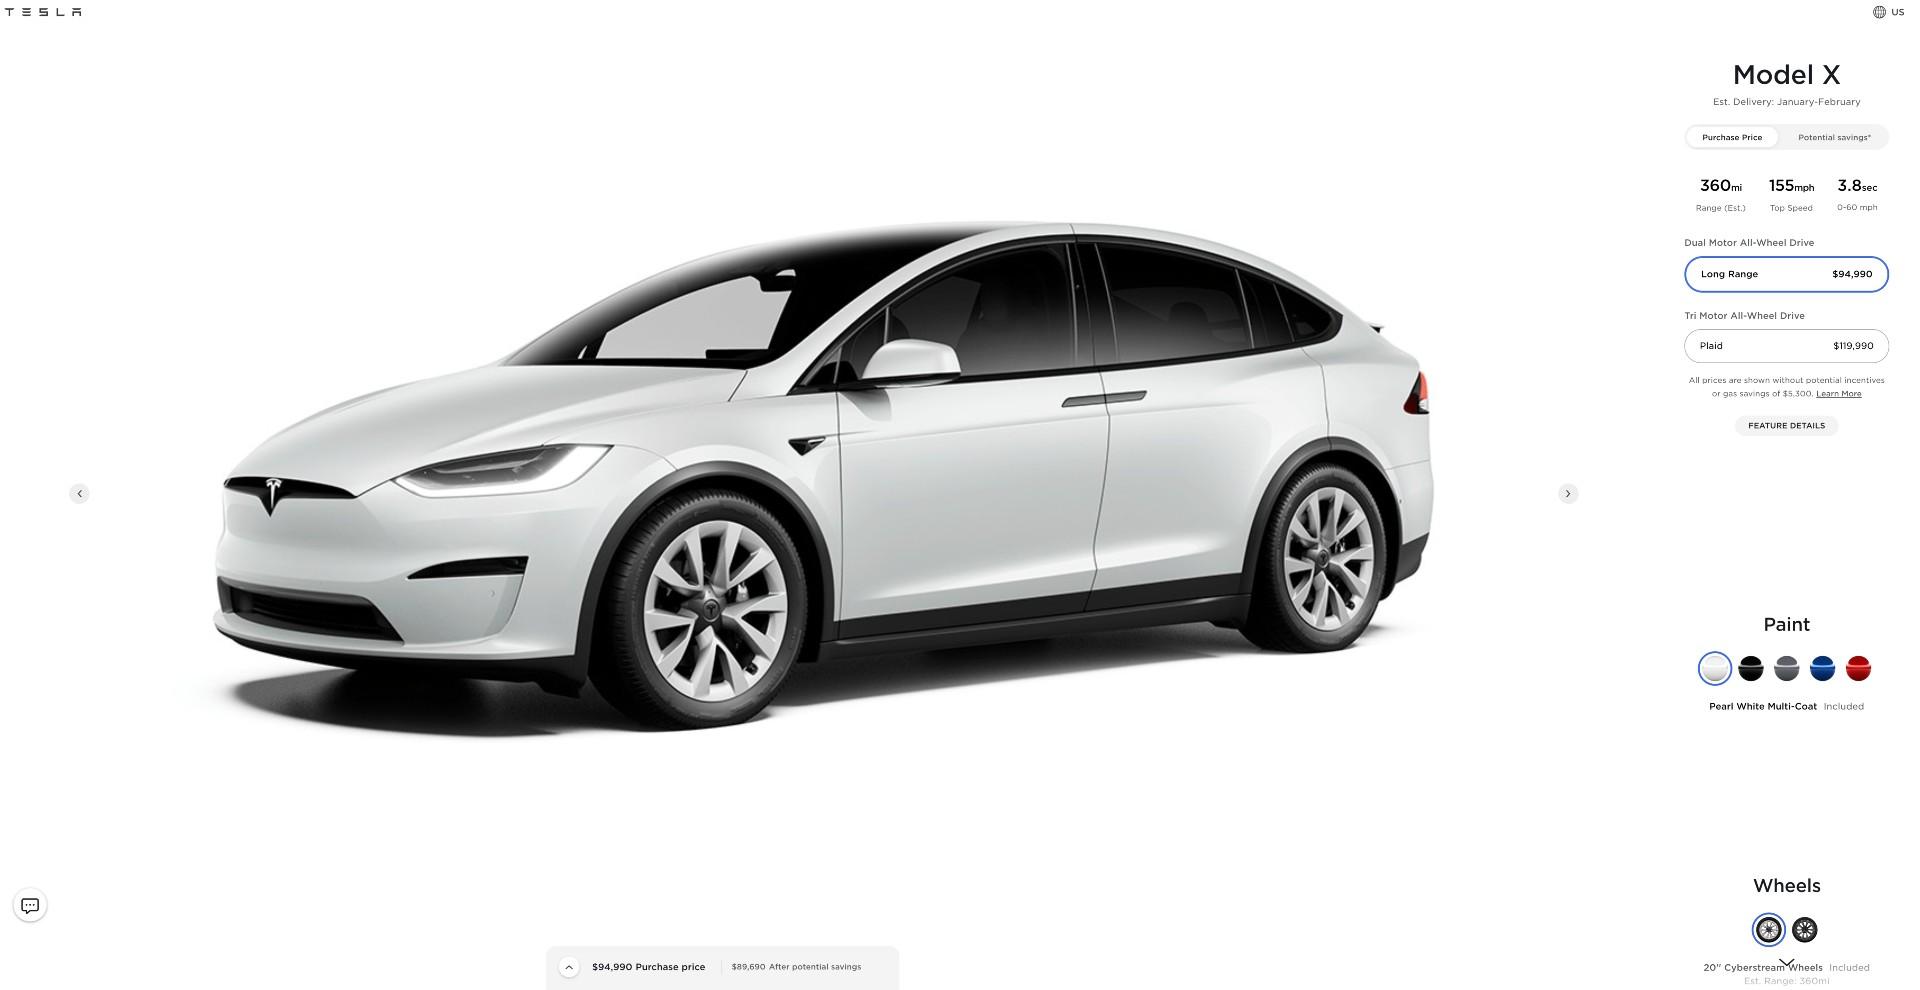 tesla-model-x-price-increase-july-9 (1)